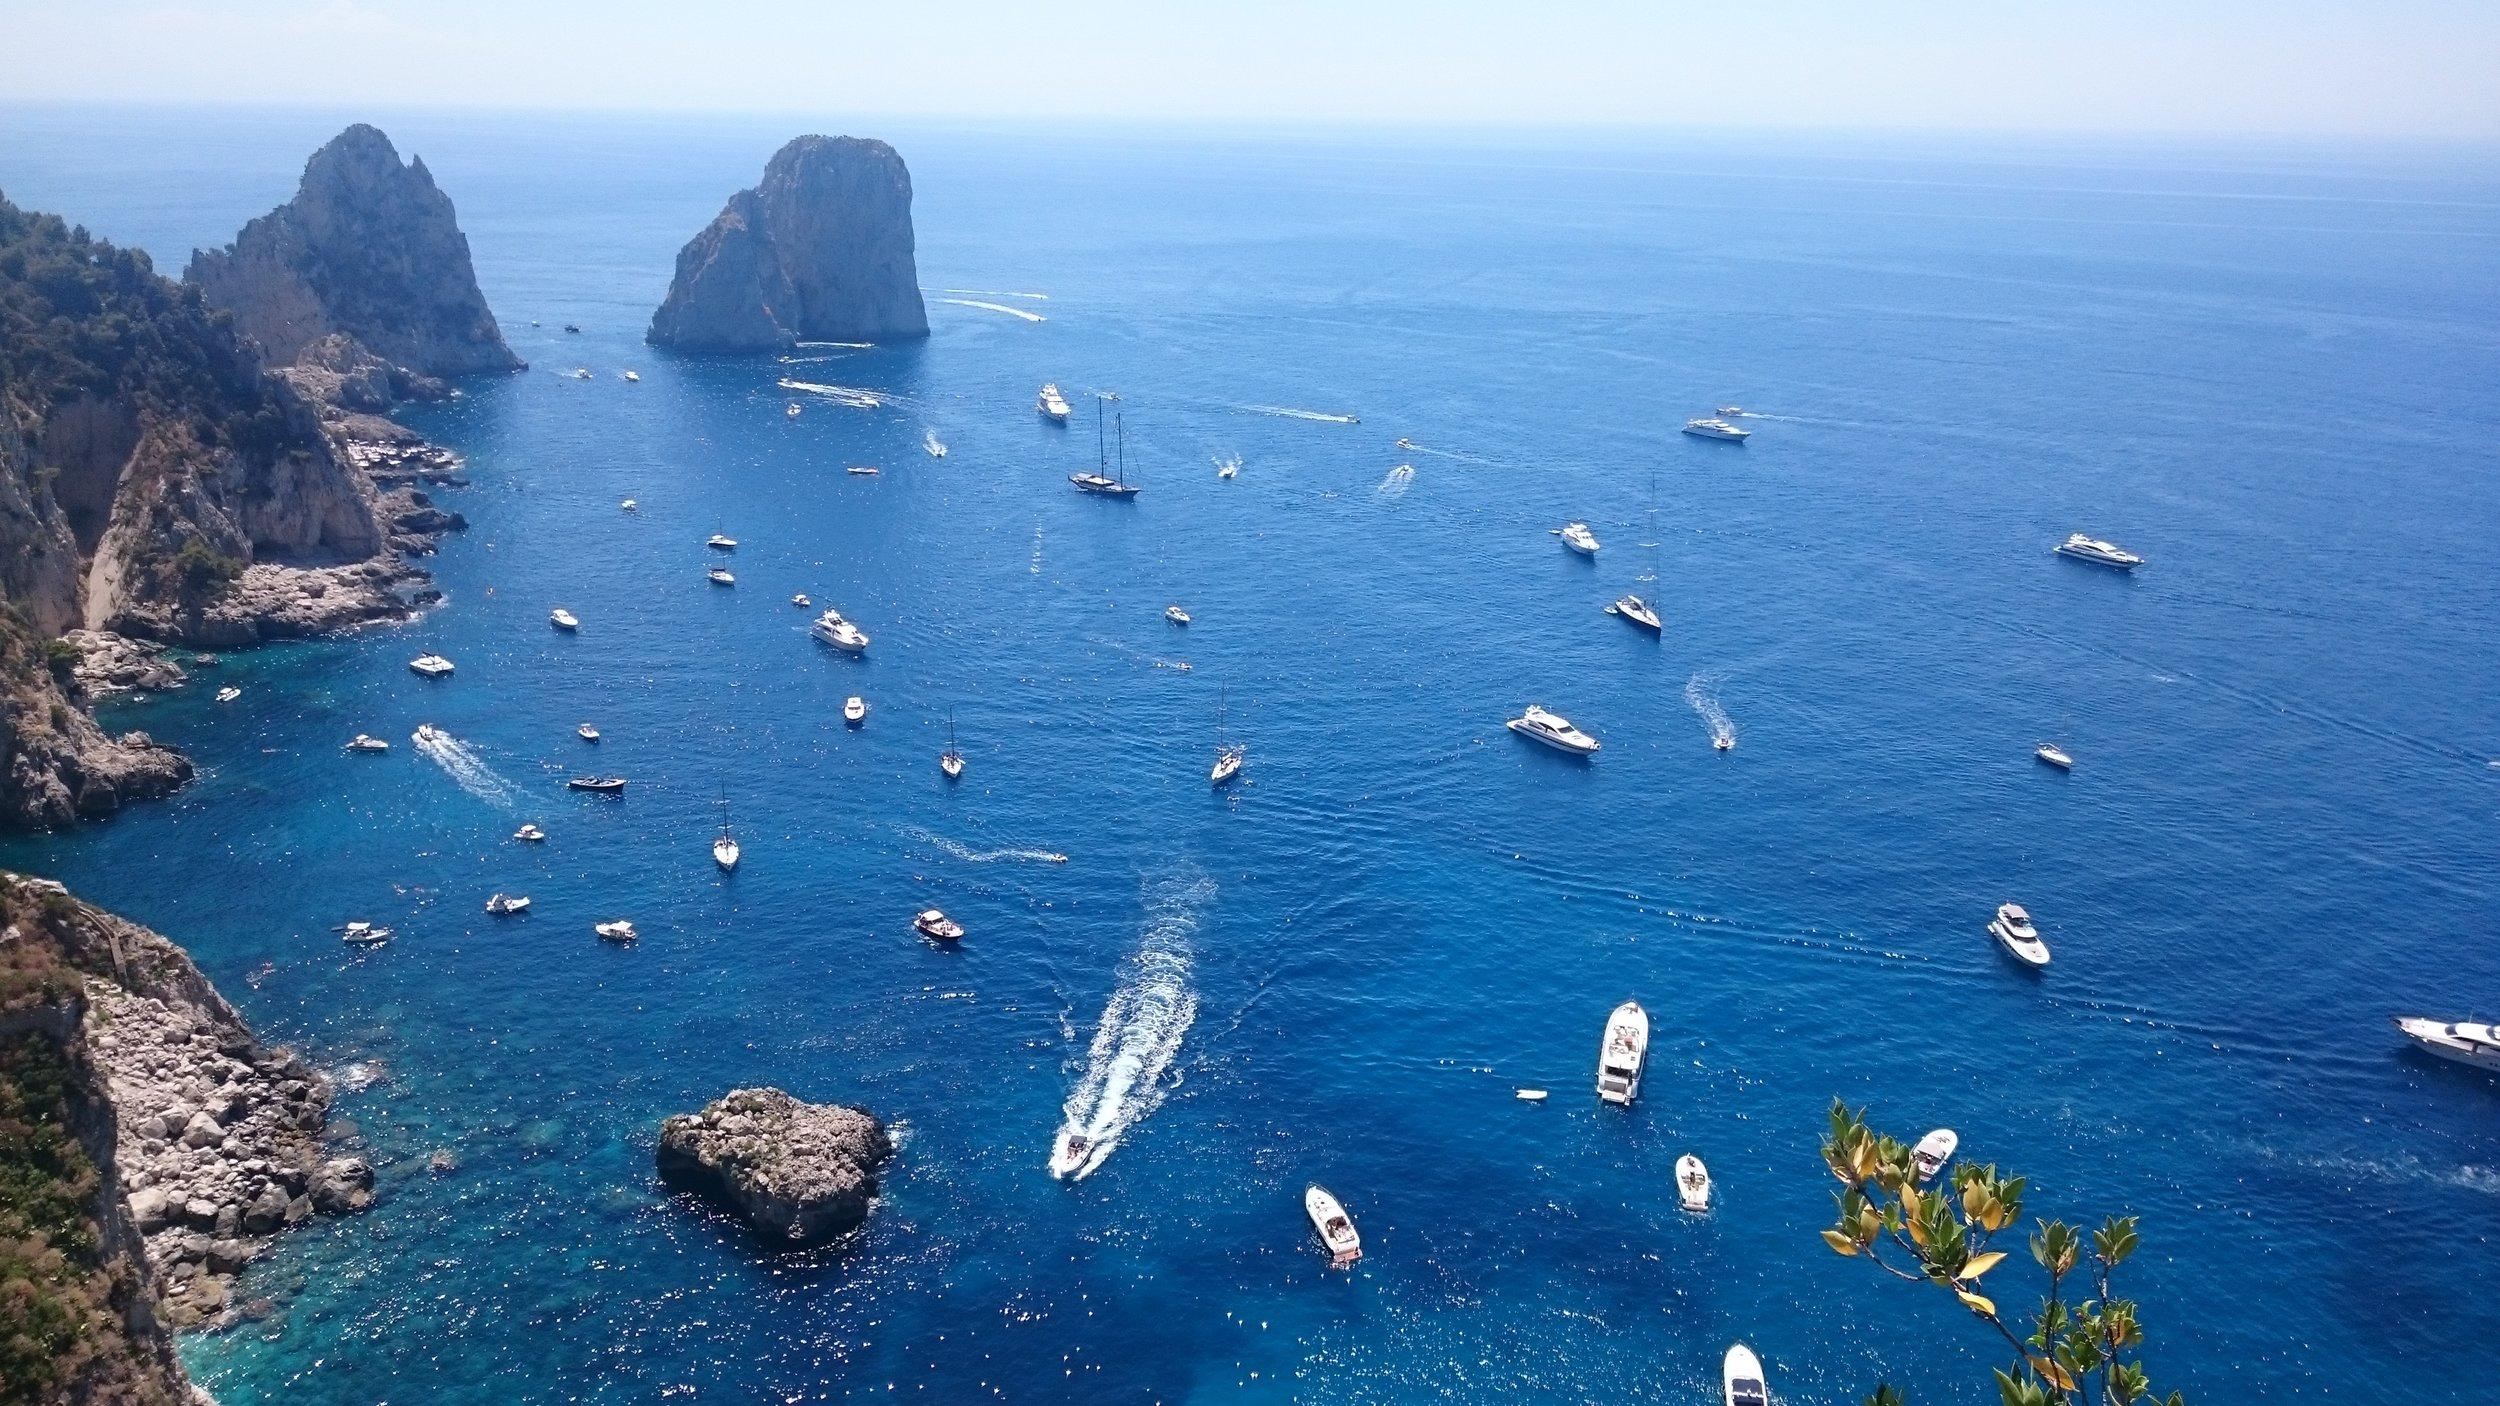 boat tour around the island of capri it is worth it